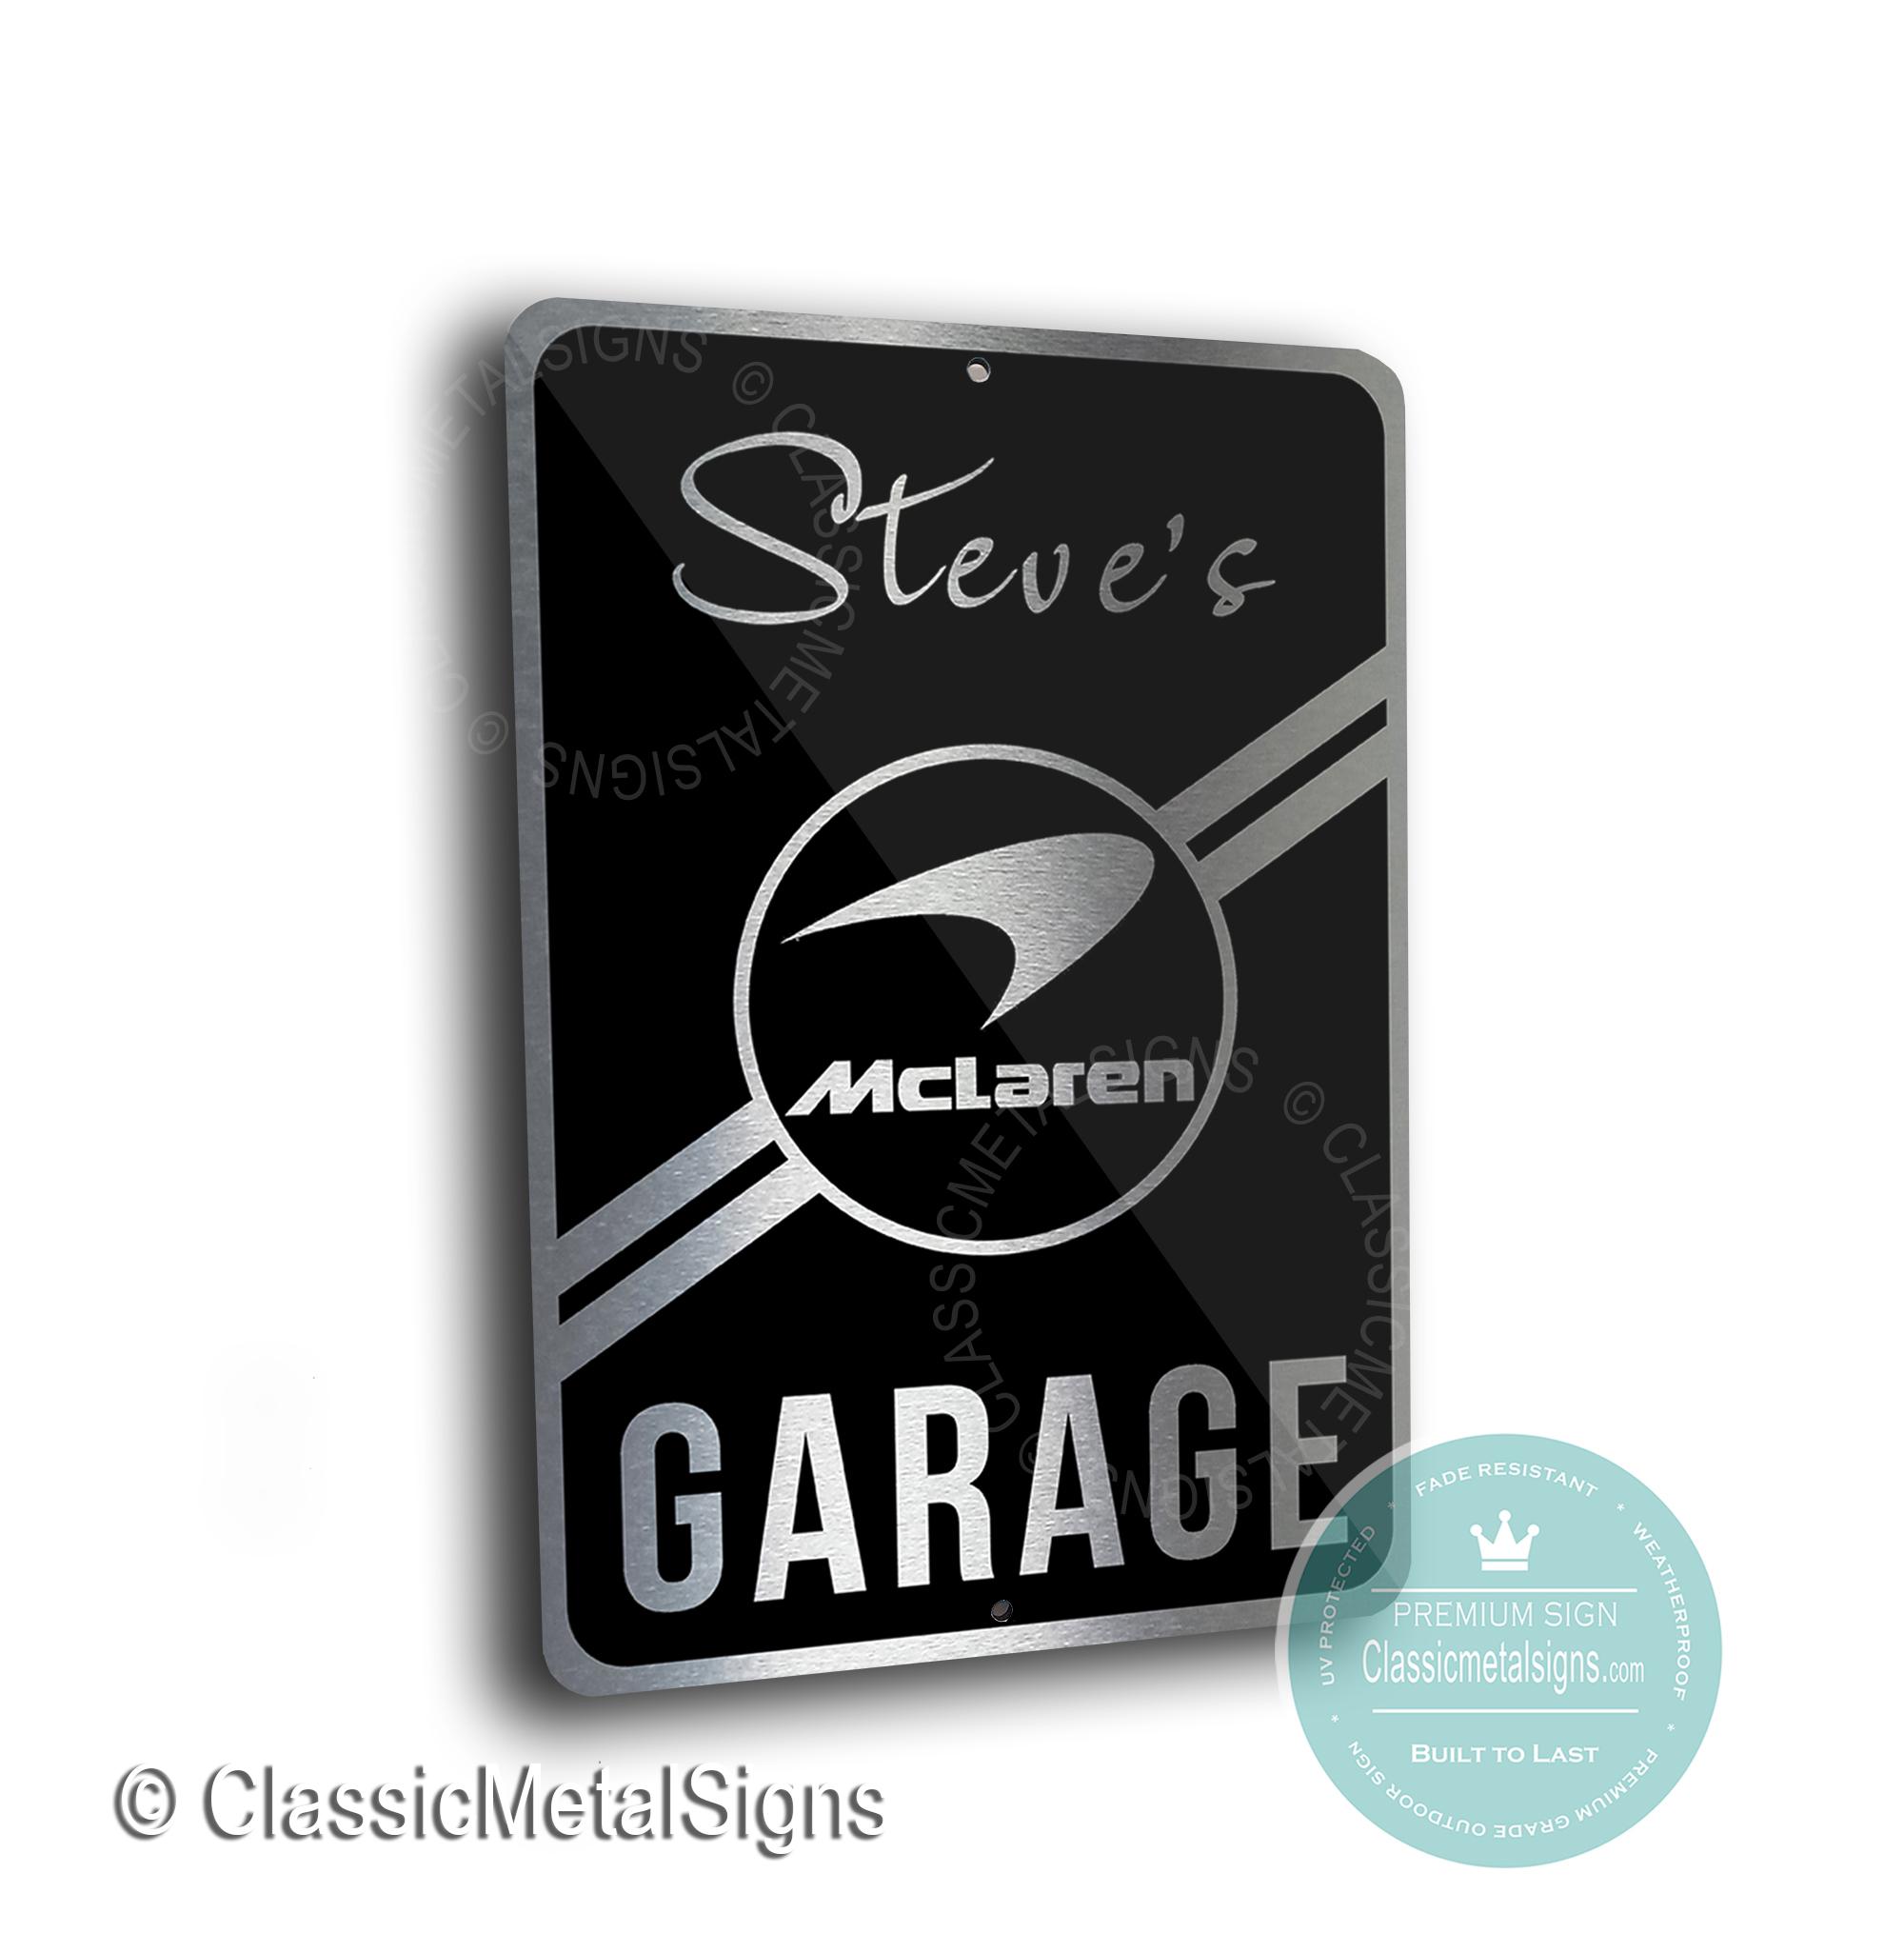 McLaren Garage Signs